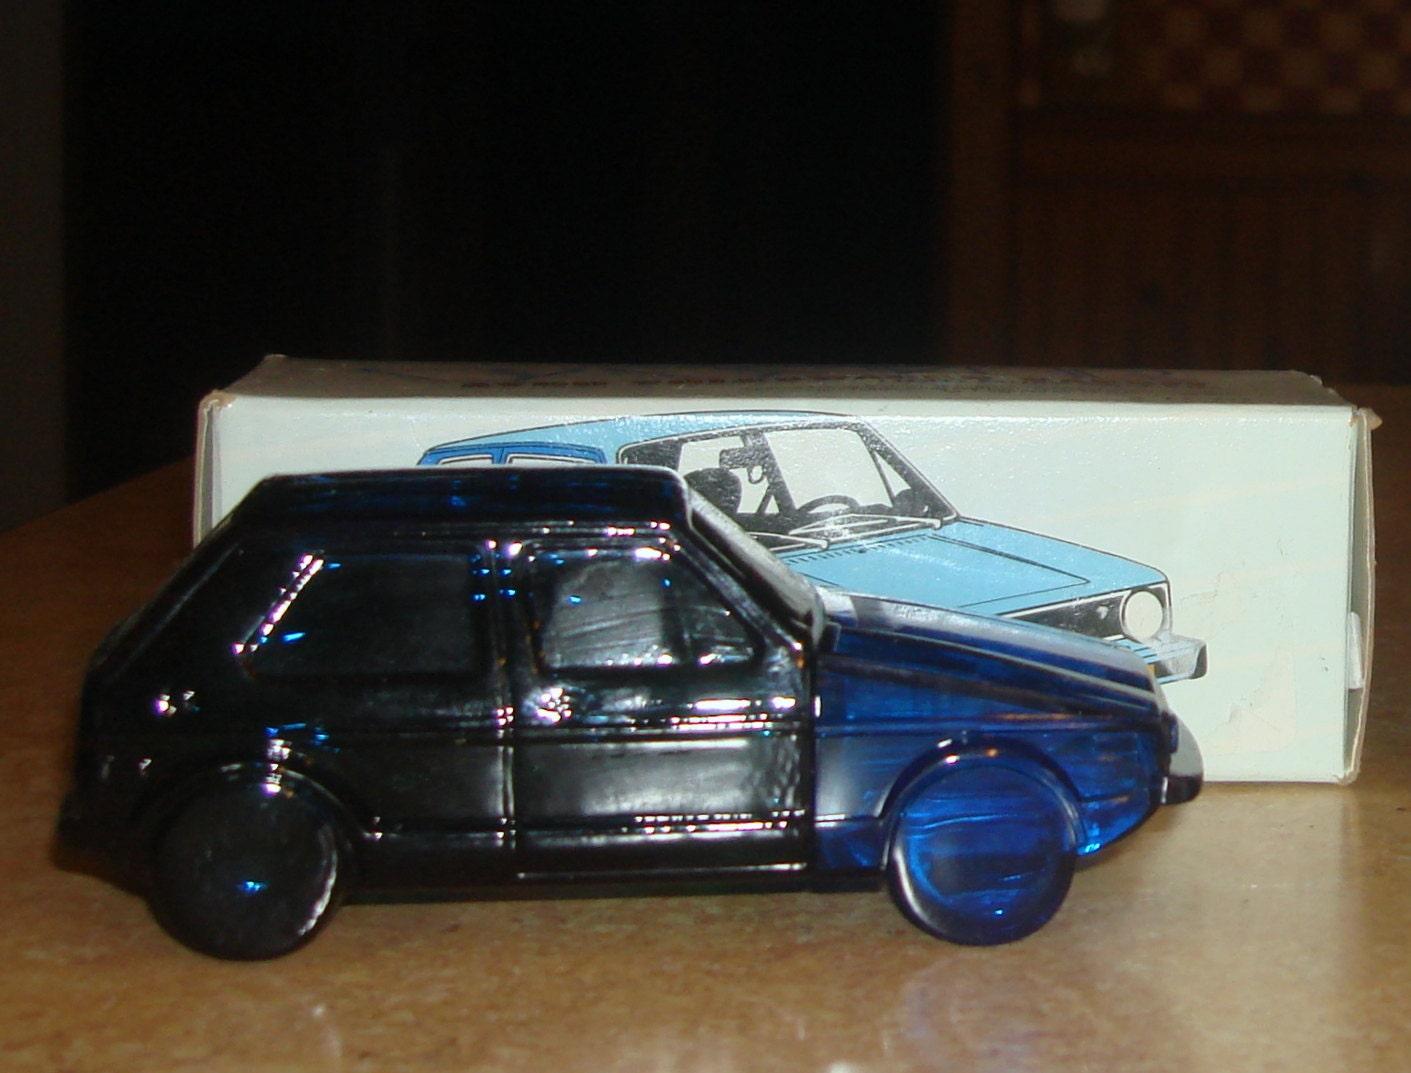 vintage avon volkswagen rabbit cologne decanter in the box. Black Bedroom Furniture Sets. Home Design Ideas